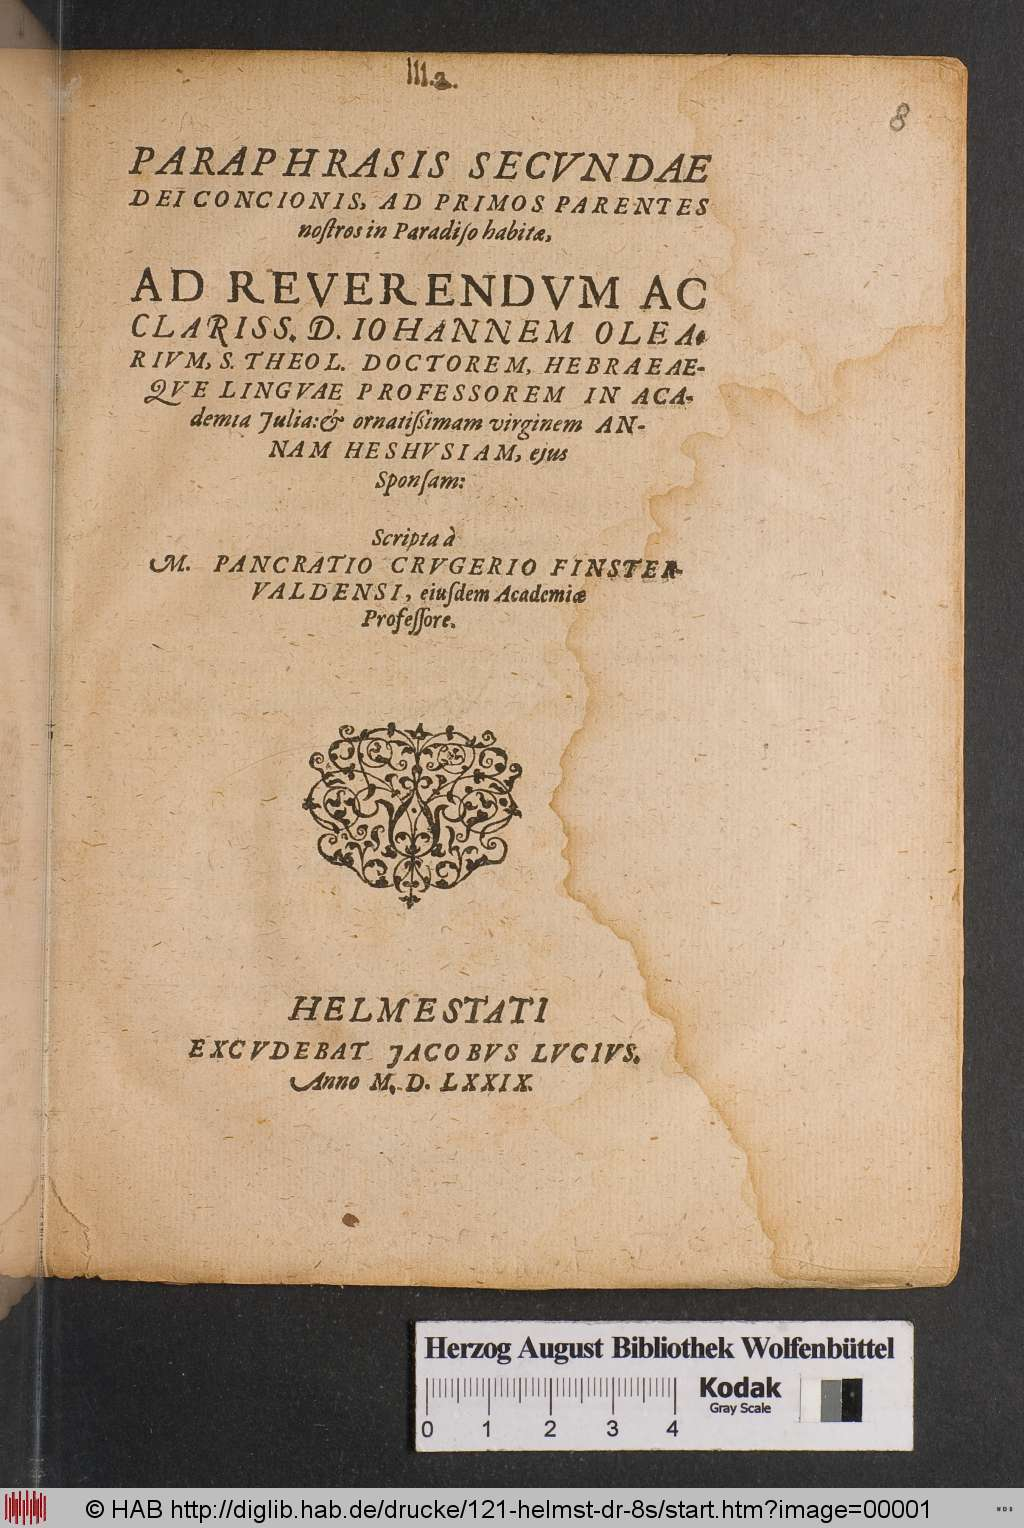 http://diglib.hab.de/drucke/121-helmst-dr-8s/00001.jpg